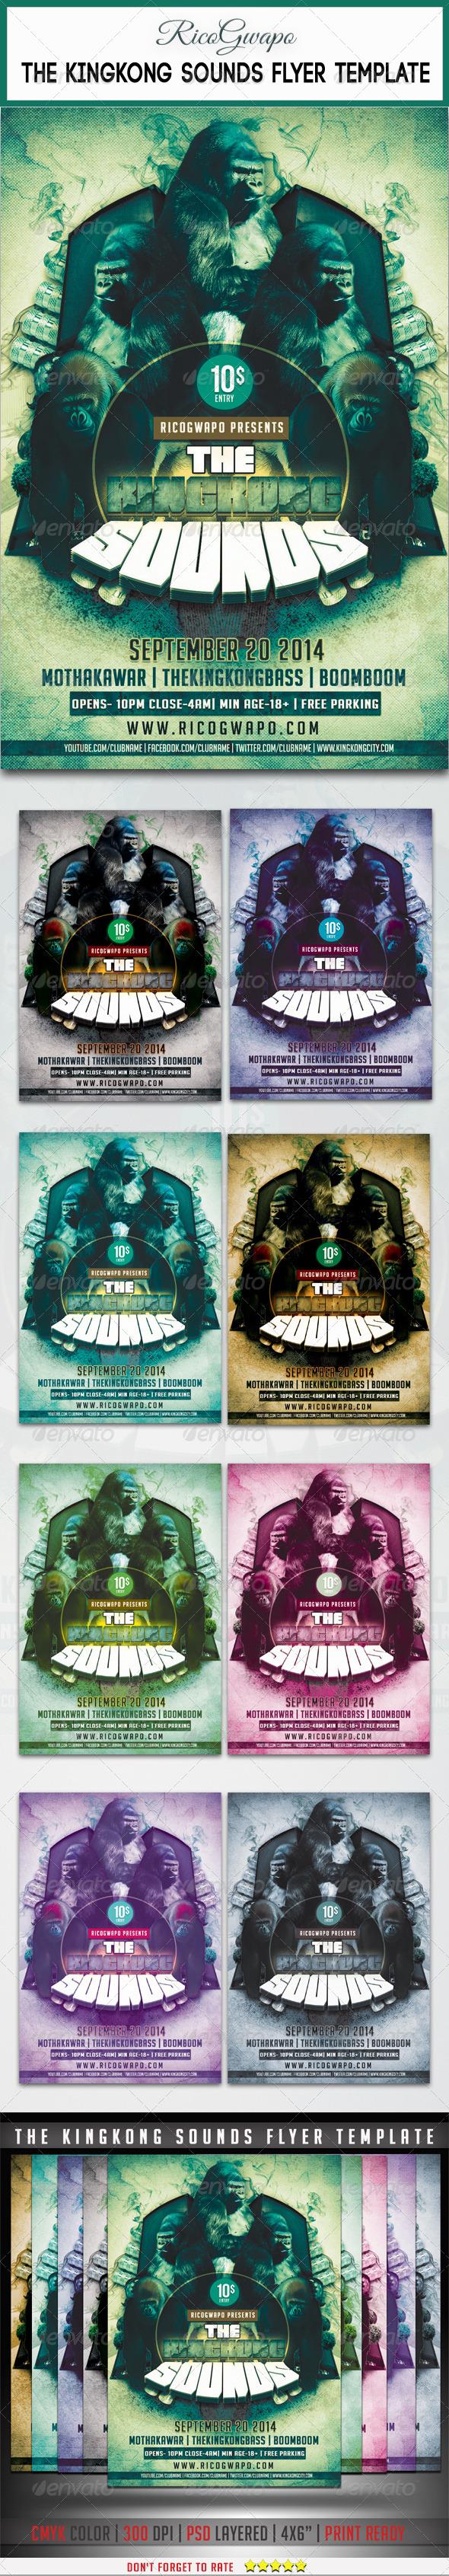 GraphicRiver KingKong Sounds Flyer Template 7844909